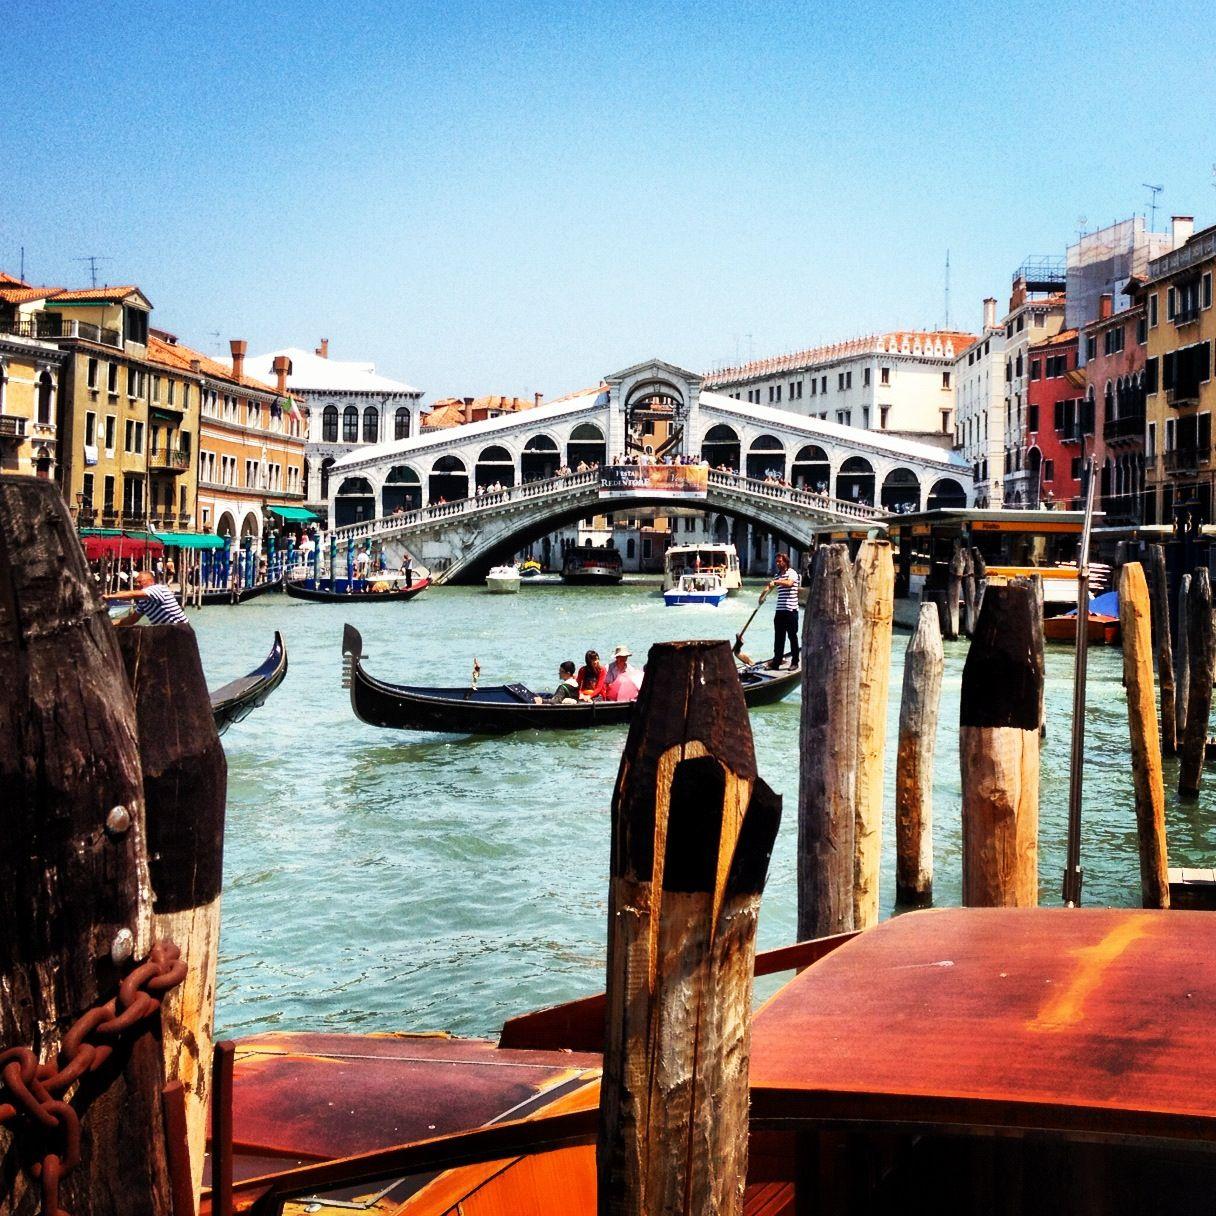 Amazing Places To Go Europe: Travel, Venice, Italy, Places To Go, Europe, Water